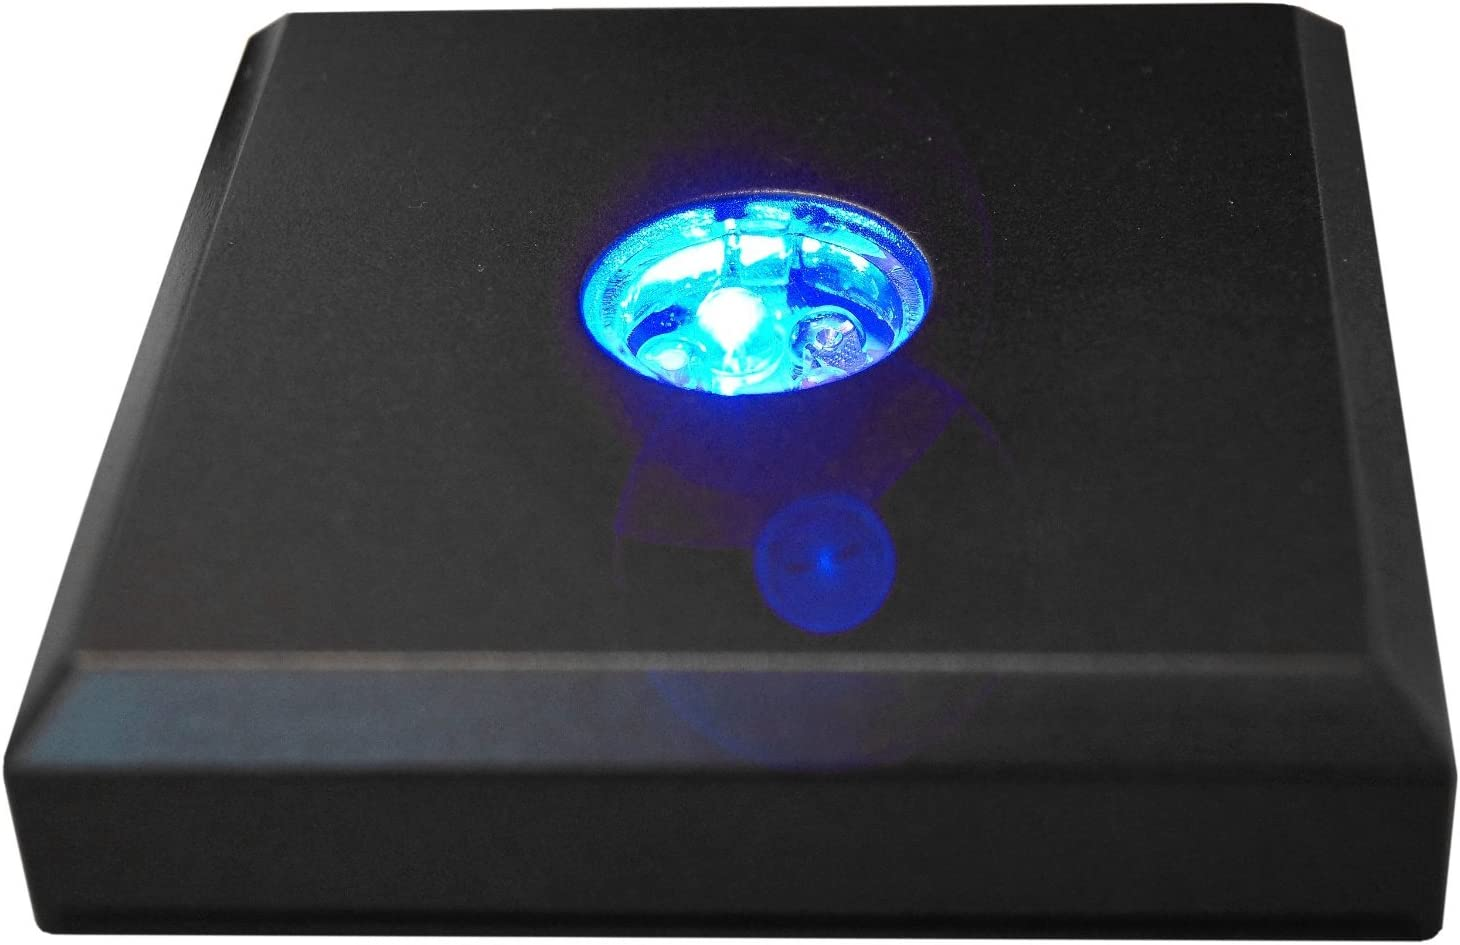 Kaltner Präsente Base LED Negro con 3 LED - Un gran regalo para adaptarse a nuestra vela LED/bloque de cristal/luces de ambiente